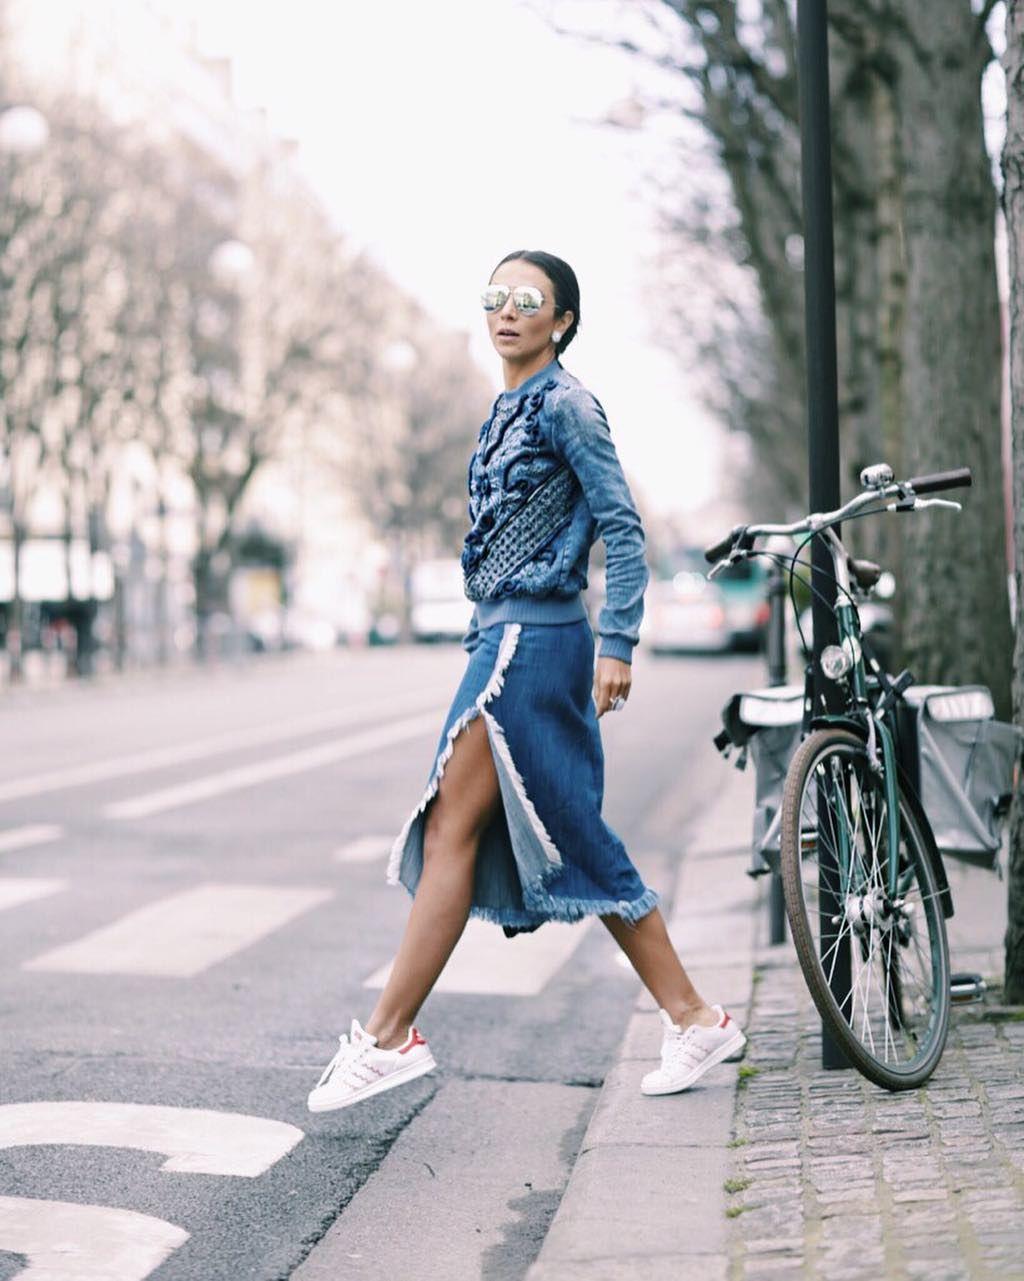 All about jeans! Tem tecido mais versátil? Da saia midi até esse moletom glamuroso da @fabianamilazzo  saia #zara e tênis @adidasbrasil #lalaemparis #lalaontour @fhits by lalanoleto